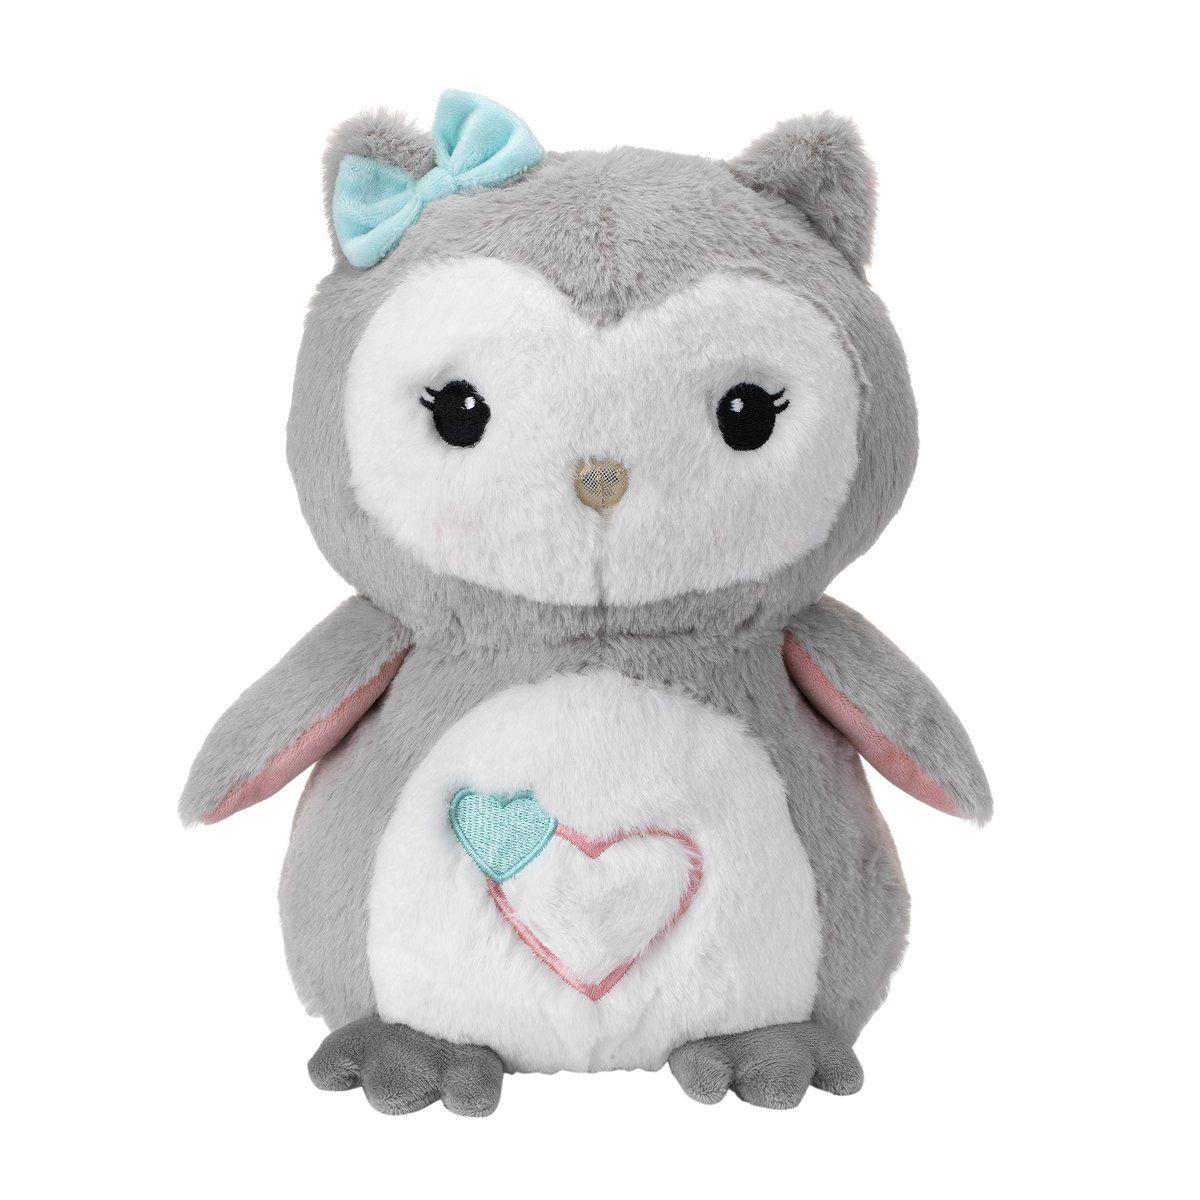 e6990d9099b Lambs   Ivy Luna Owl Plush Toy In White